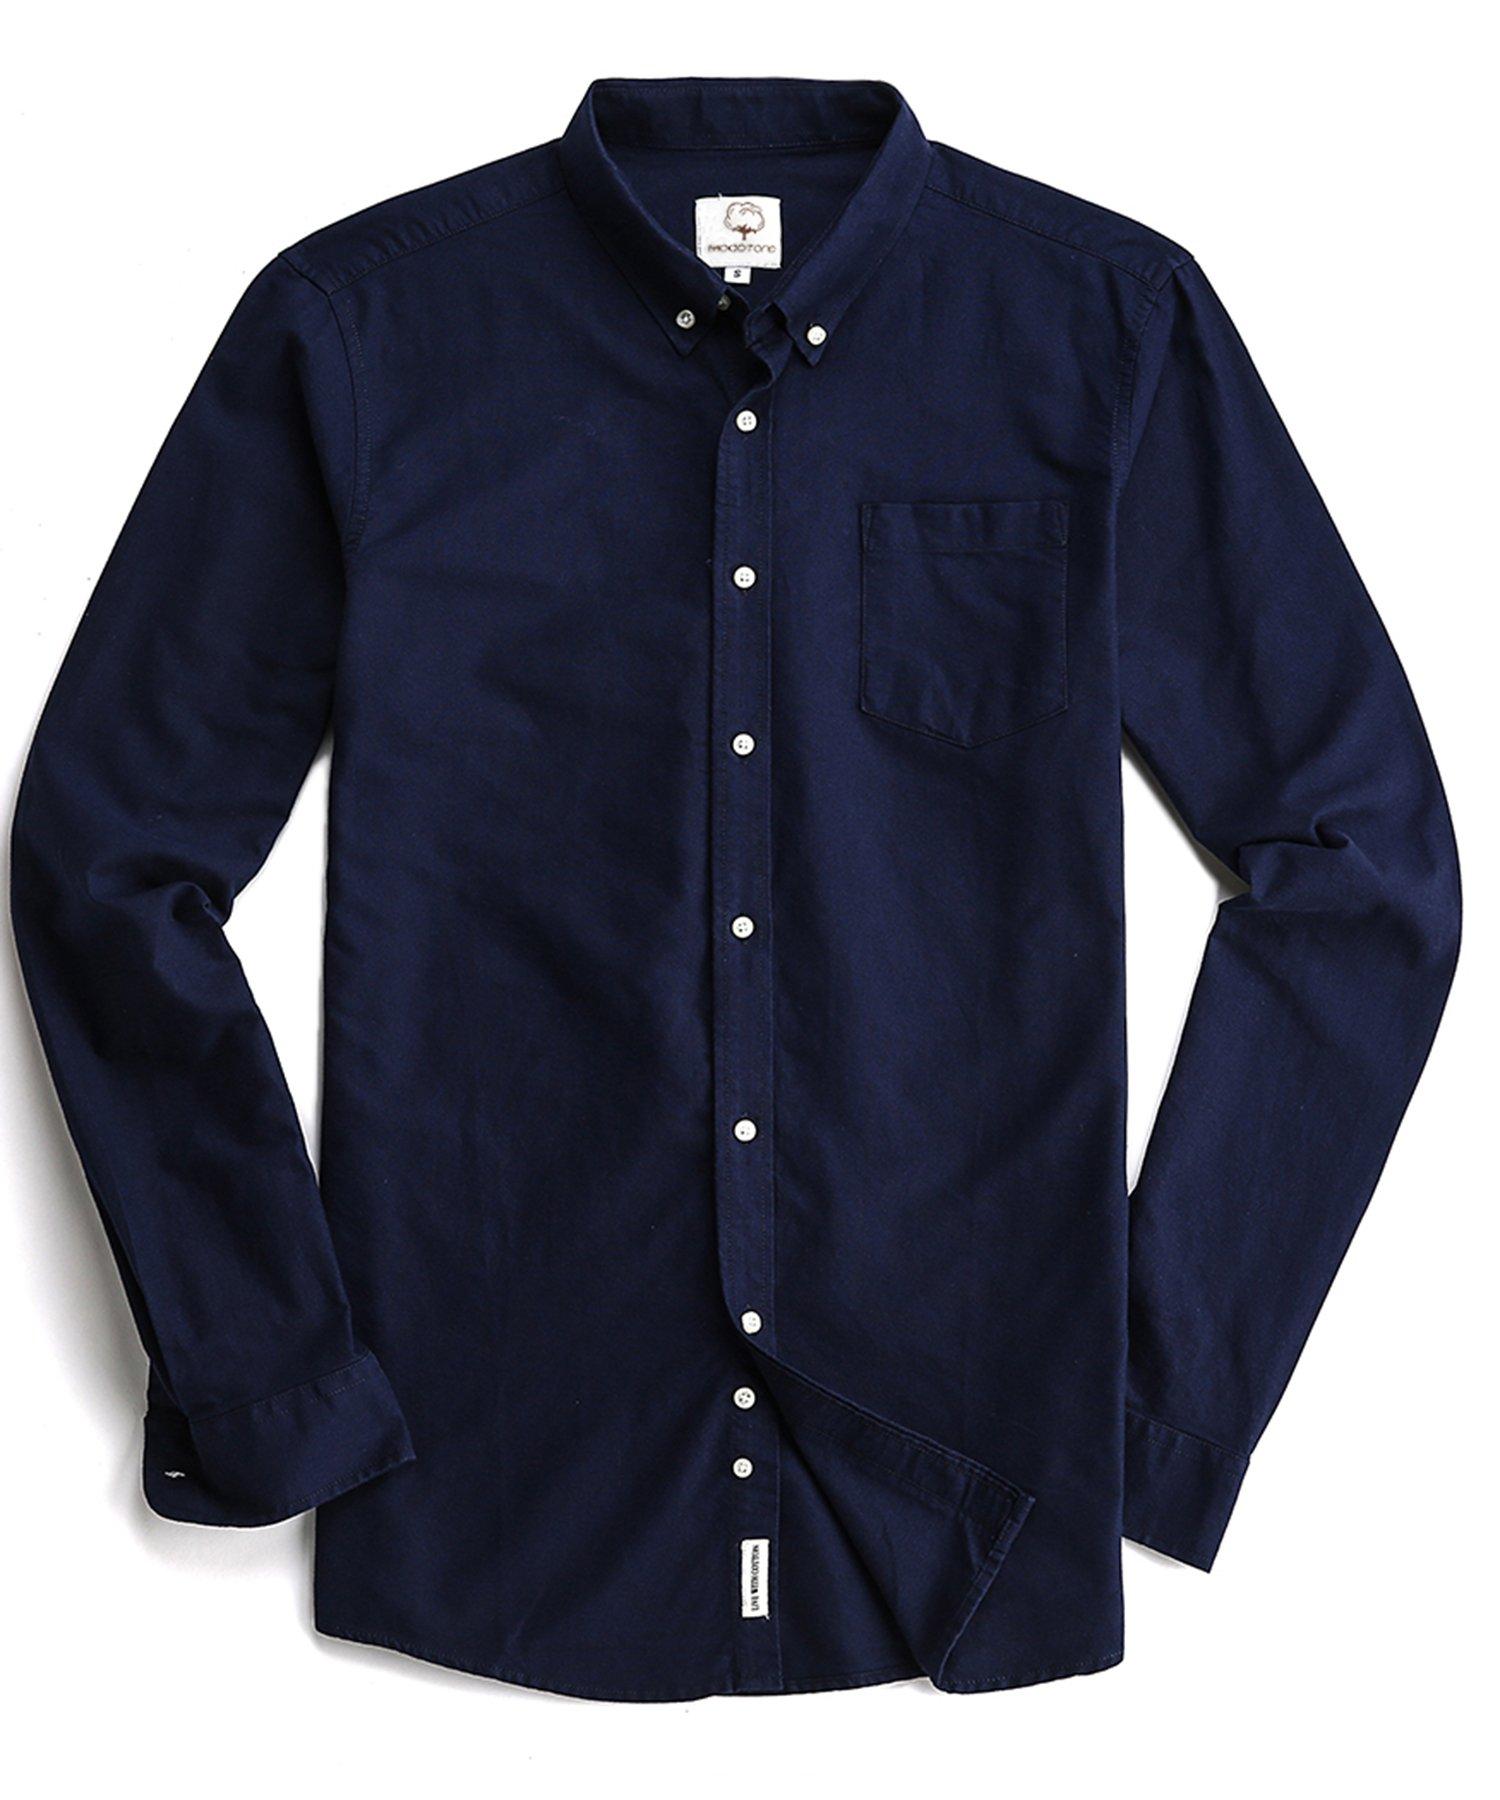 Men's Oxford Long Sleeve Button Down Dress Shirt Pocket,Navy Blue,XX-Large